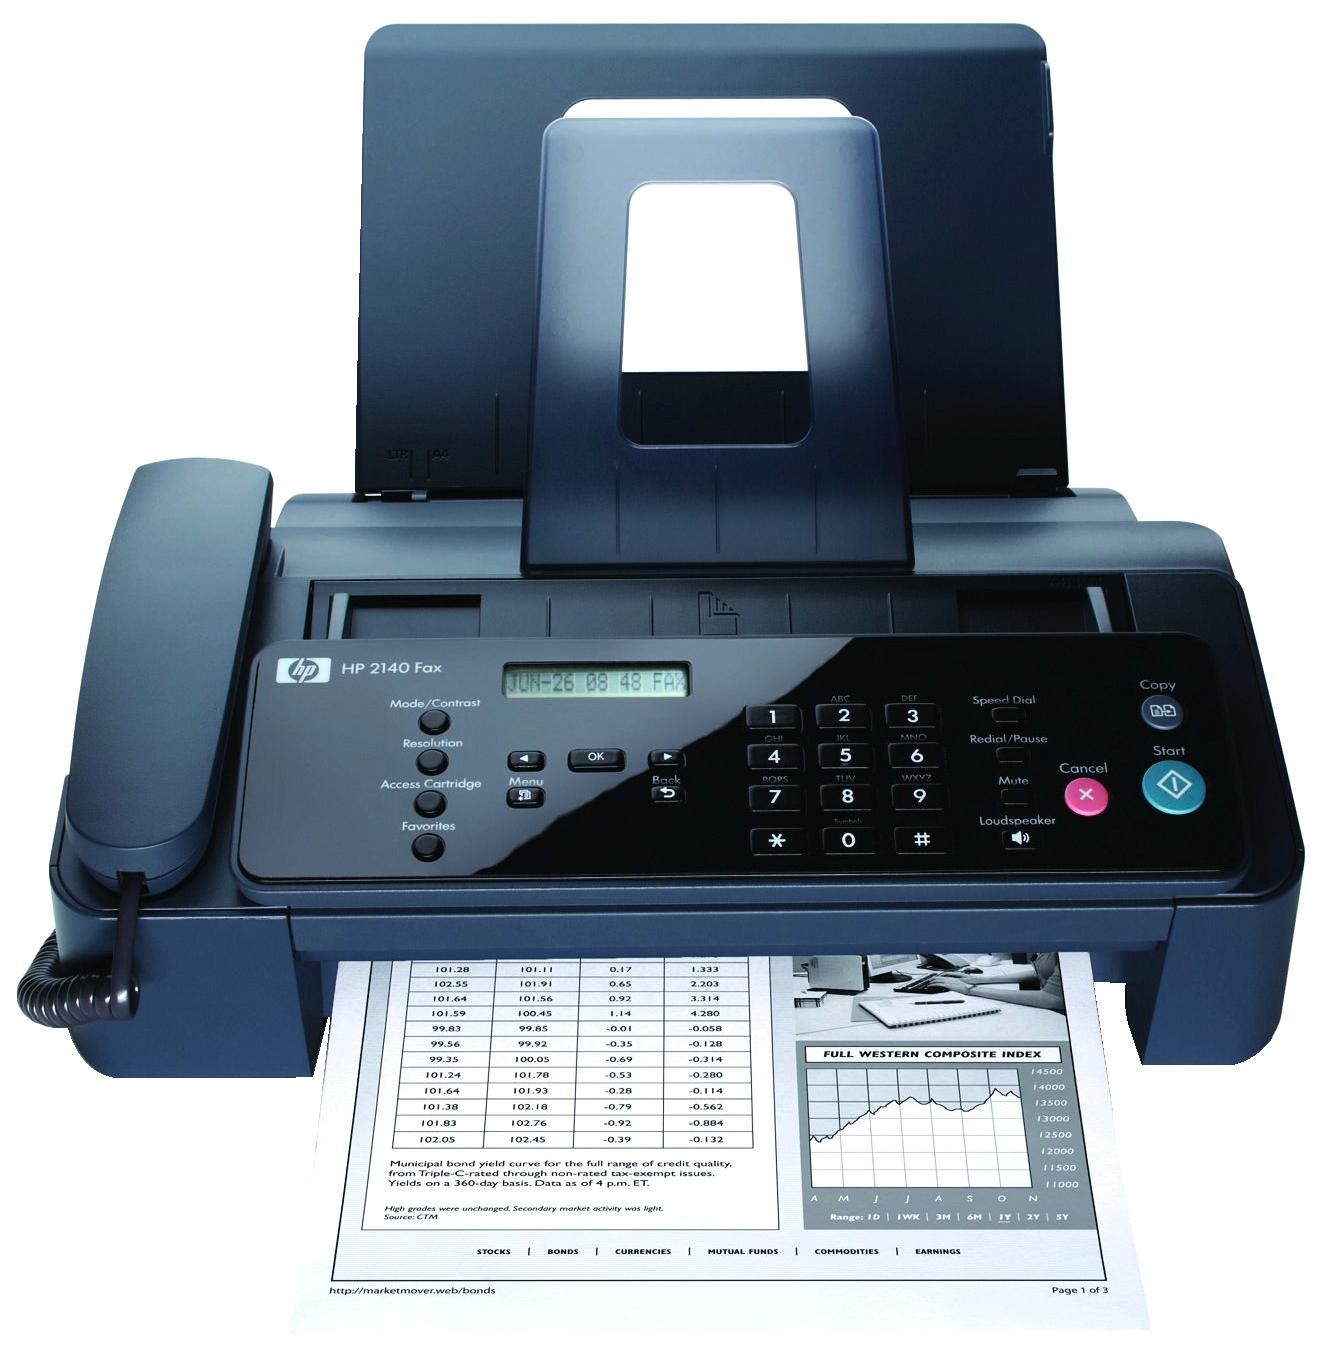 Fax Machine PNG Image Fax, Plain, Document cameras